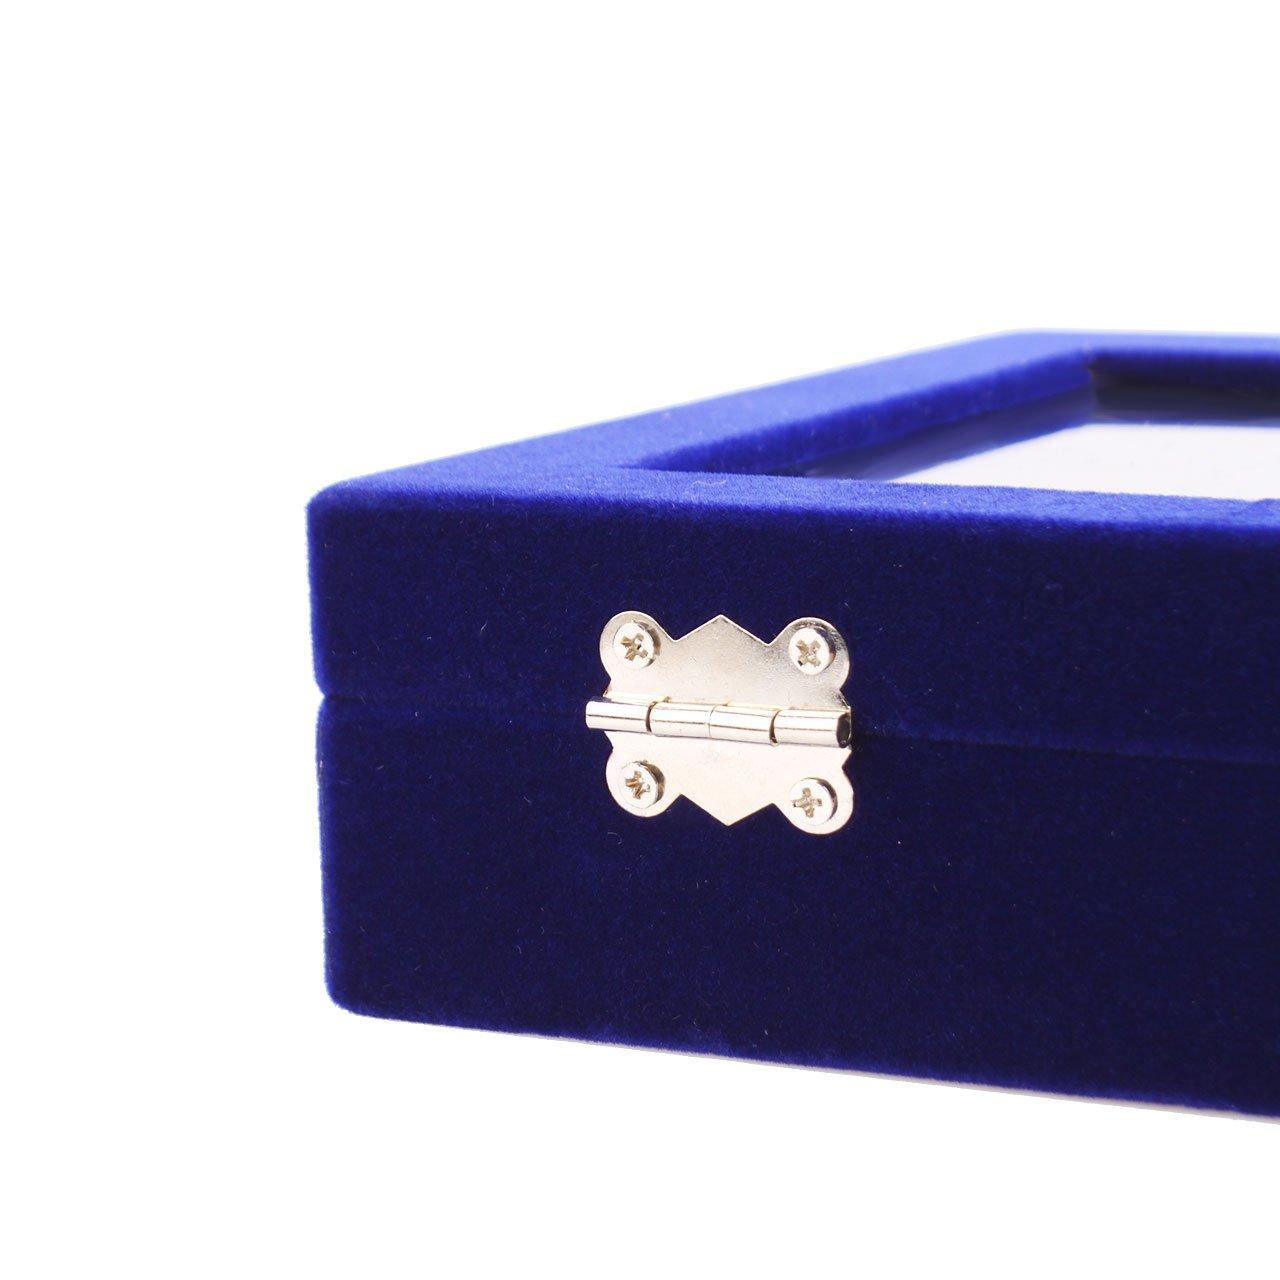 Juanza organizador caja de almacenamineto franela para joyerias anillos pulsera collar pendientes